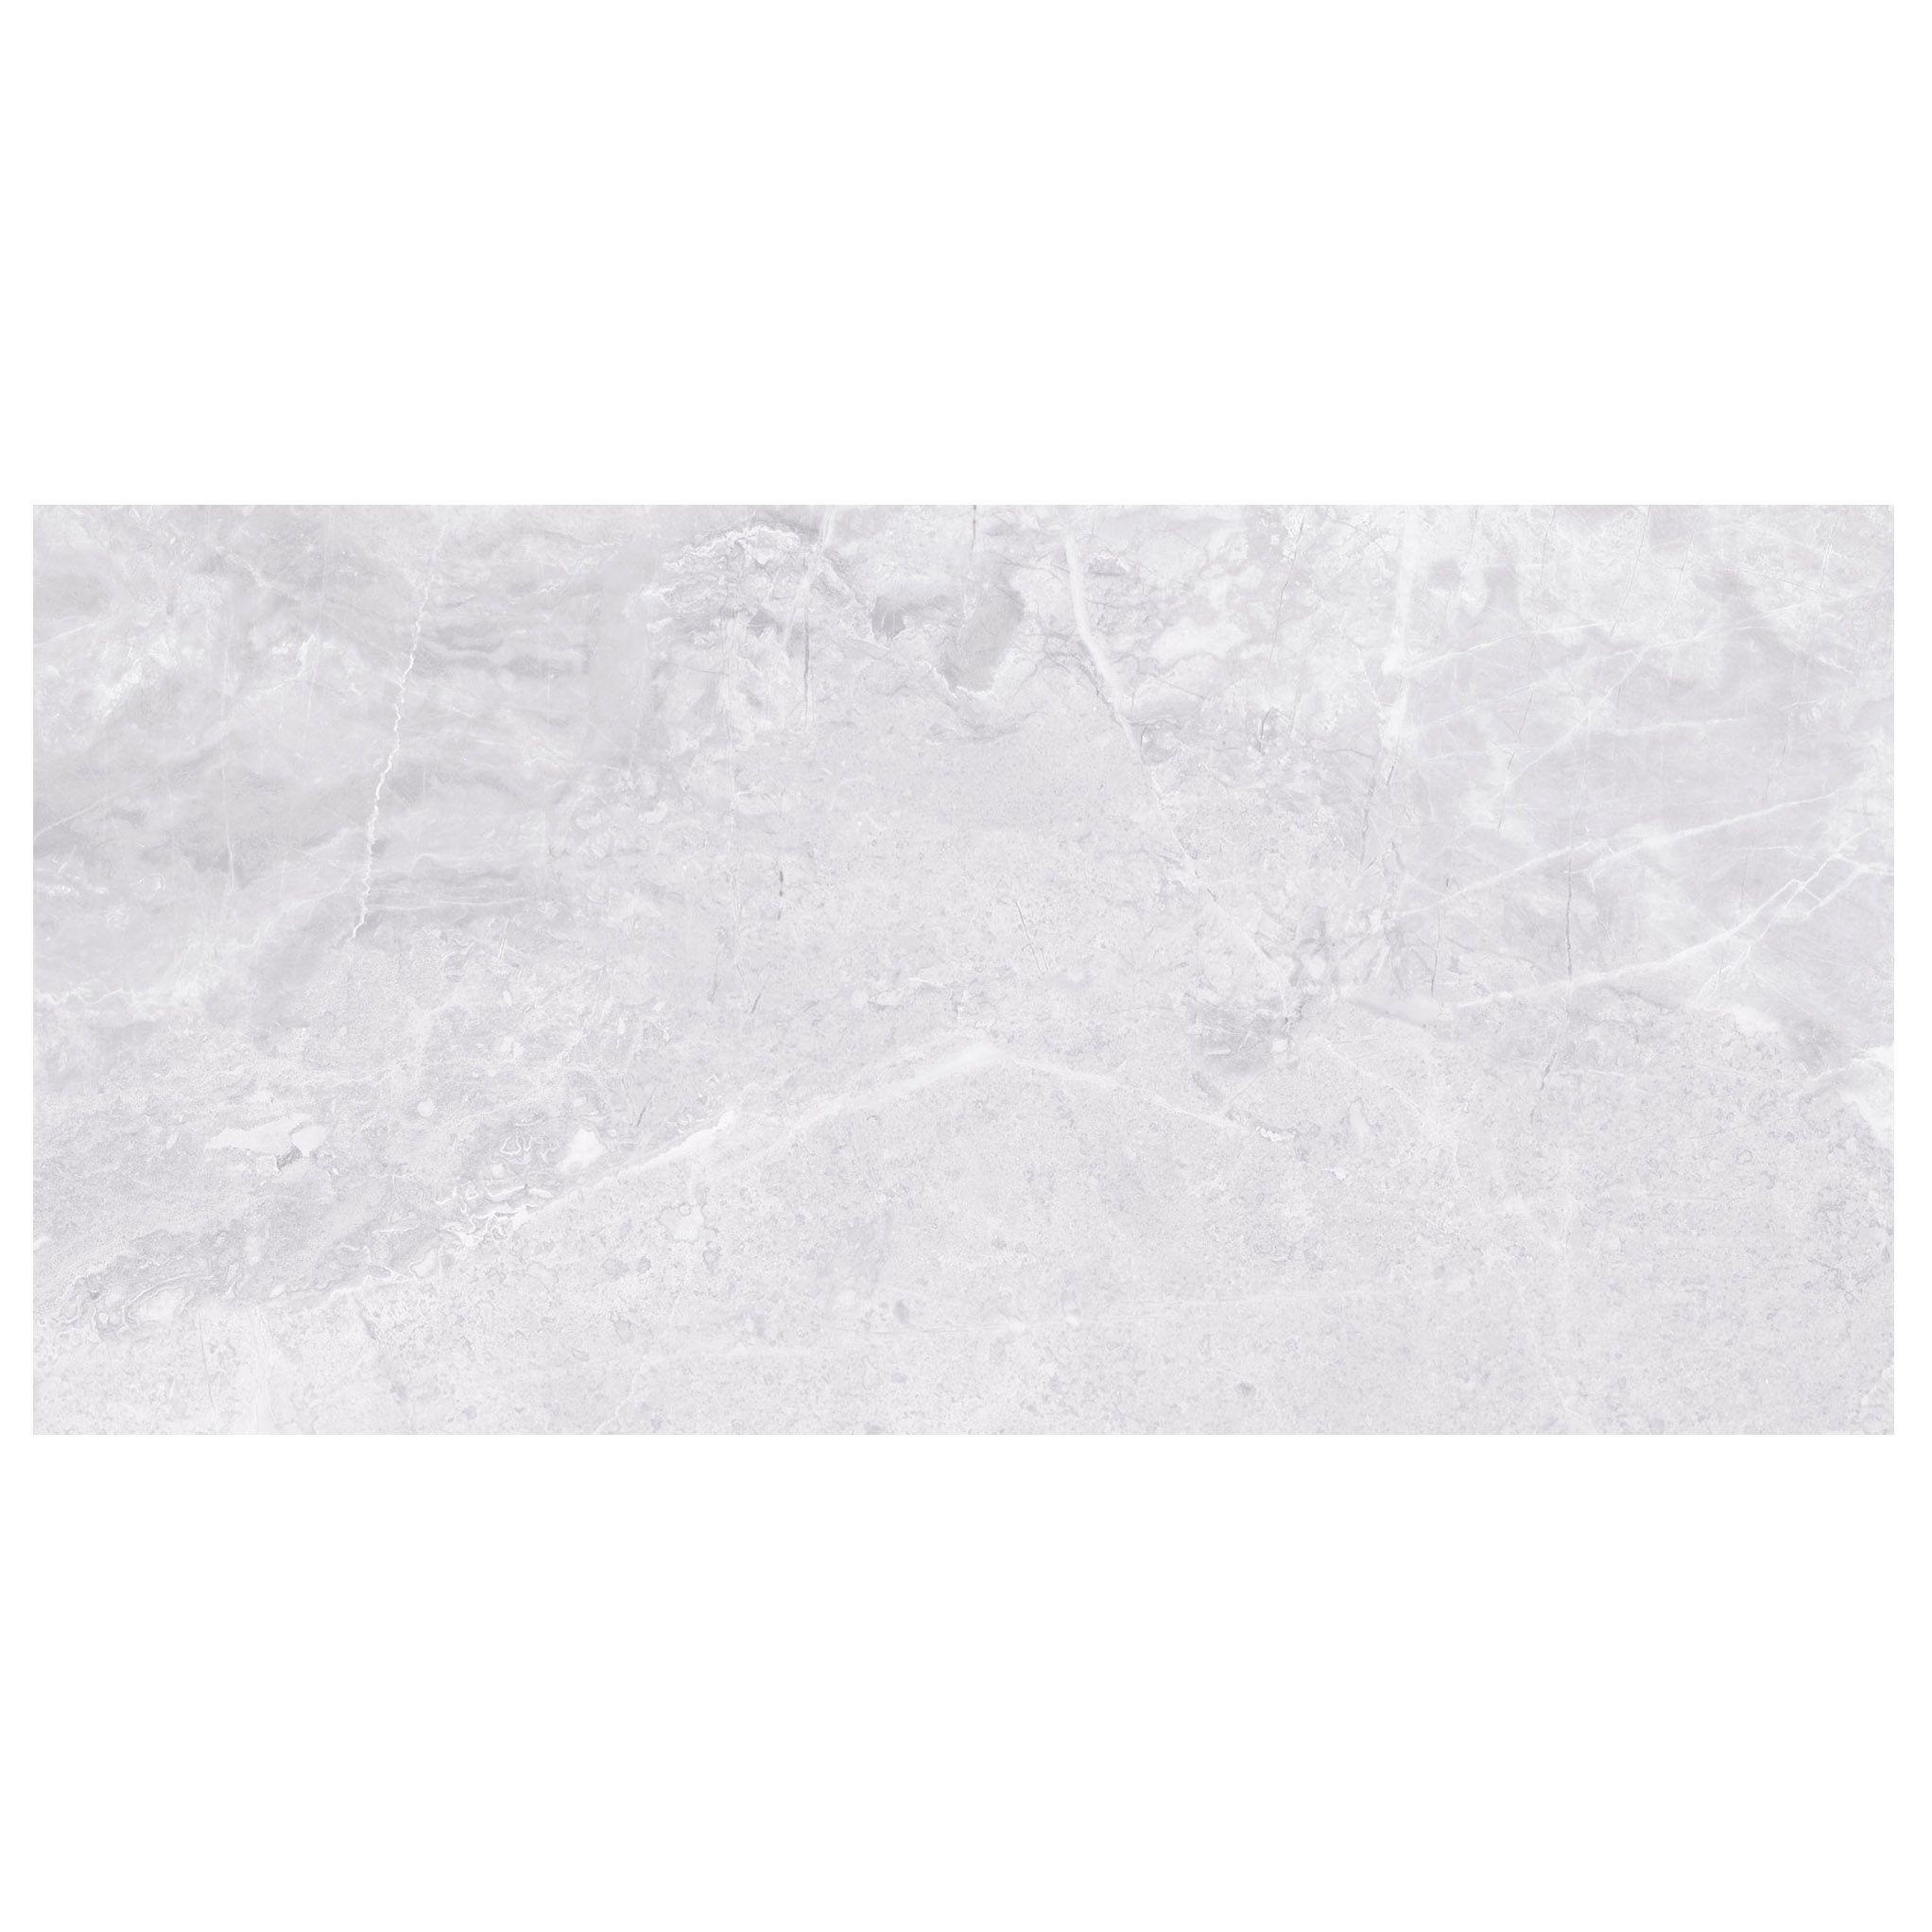 Levanto White Ceramic Wall Tile Pack Of 10 L 250mm W: Silverthorne Mist Marble Stone Effect Ceramic Wall Tile